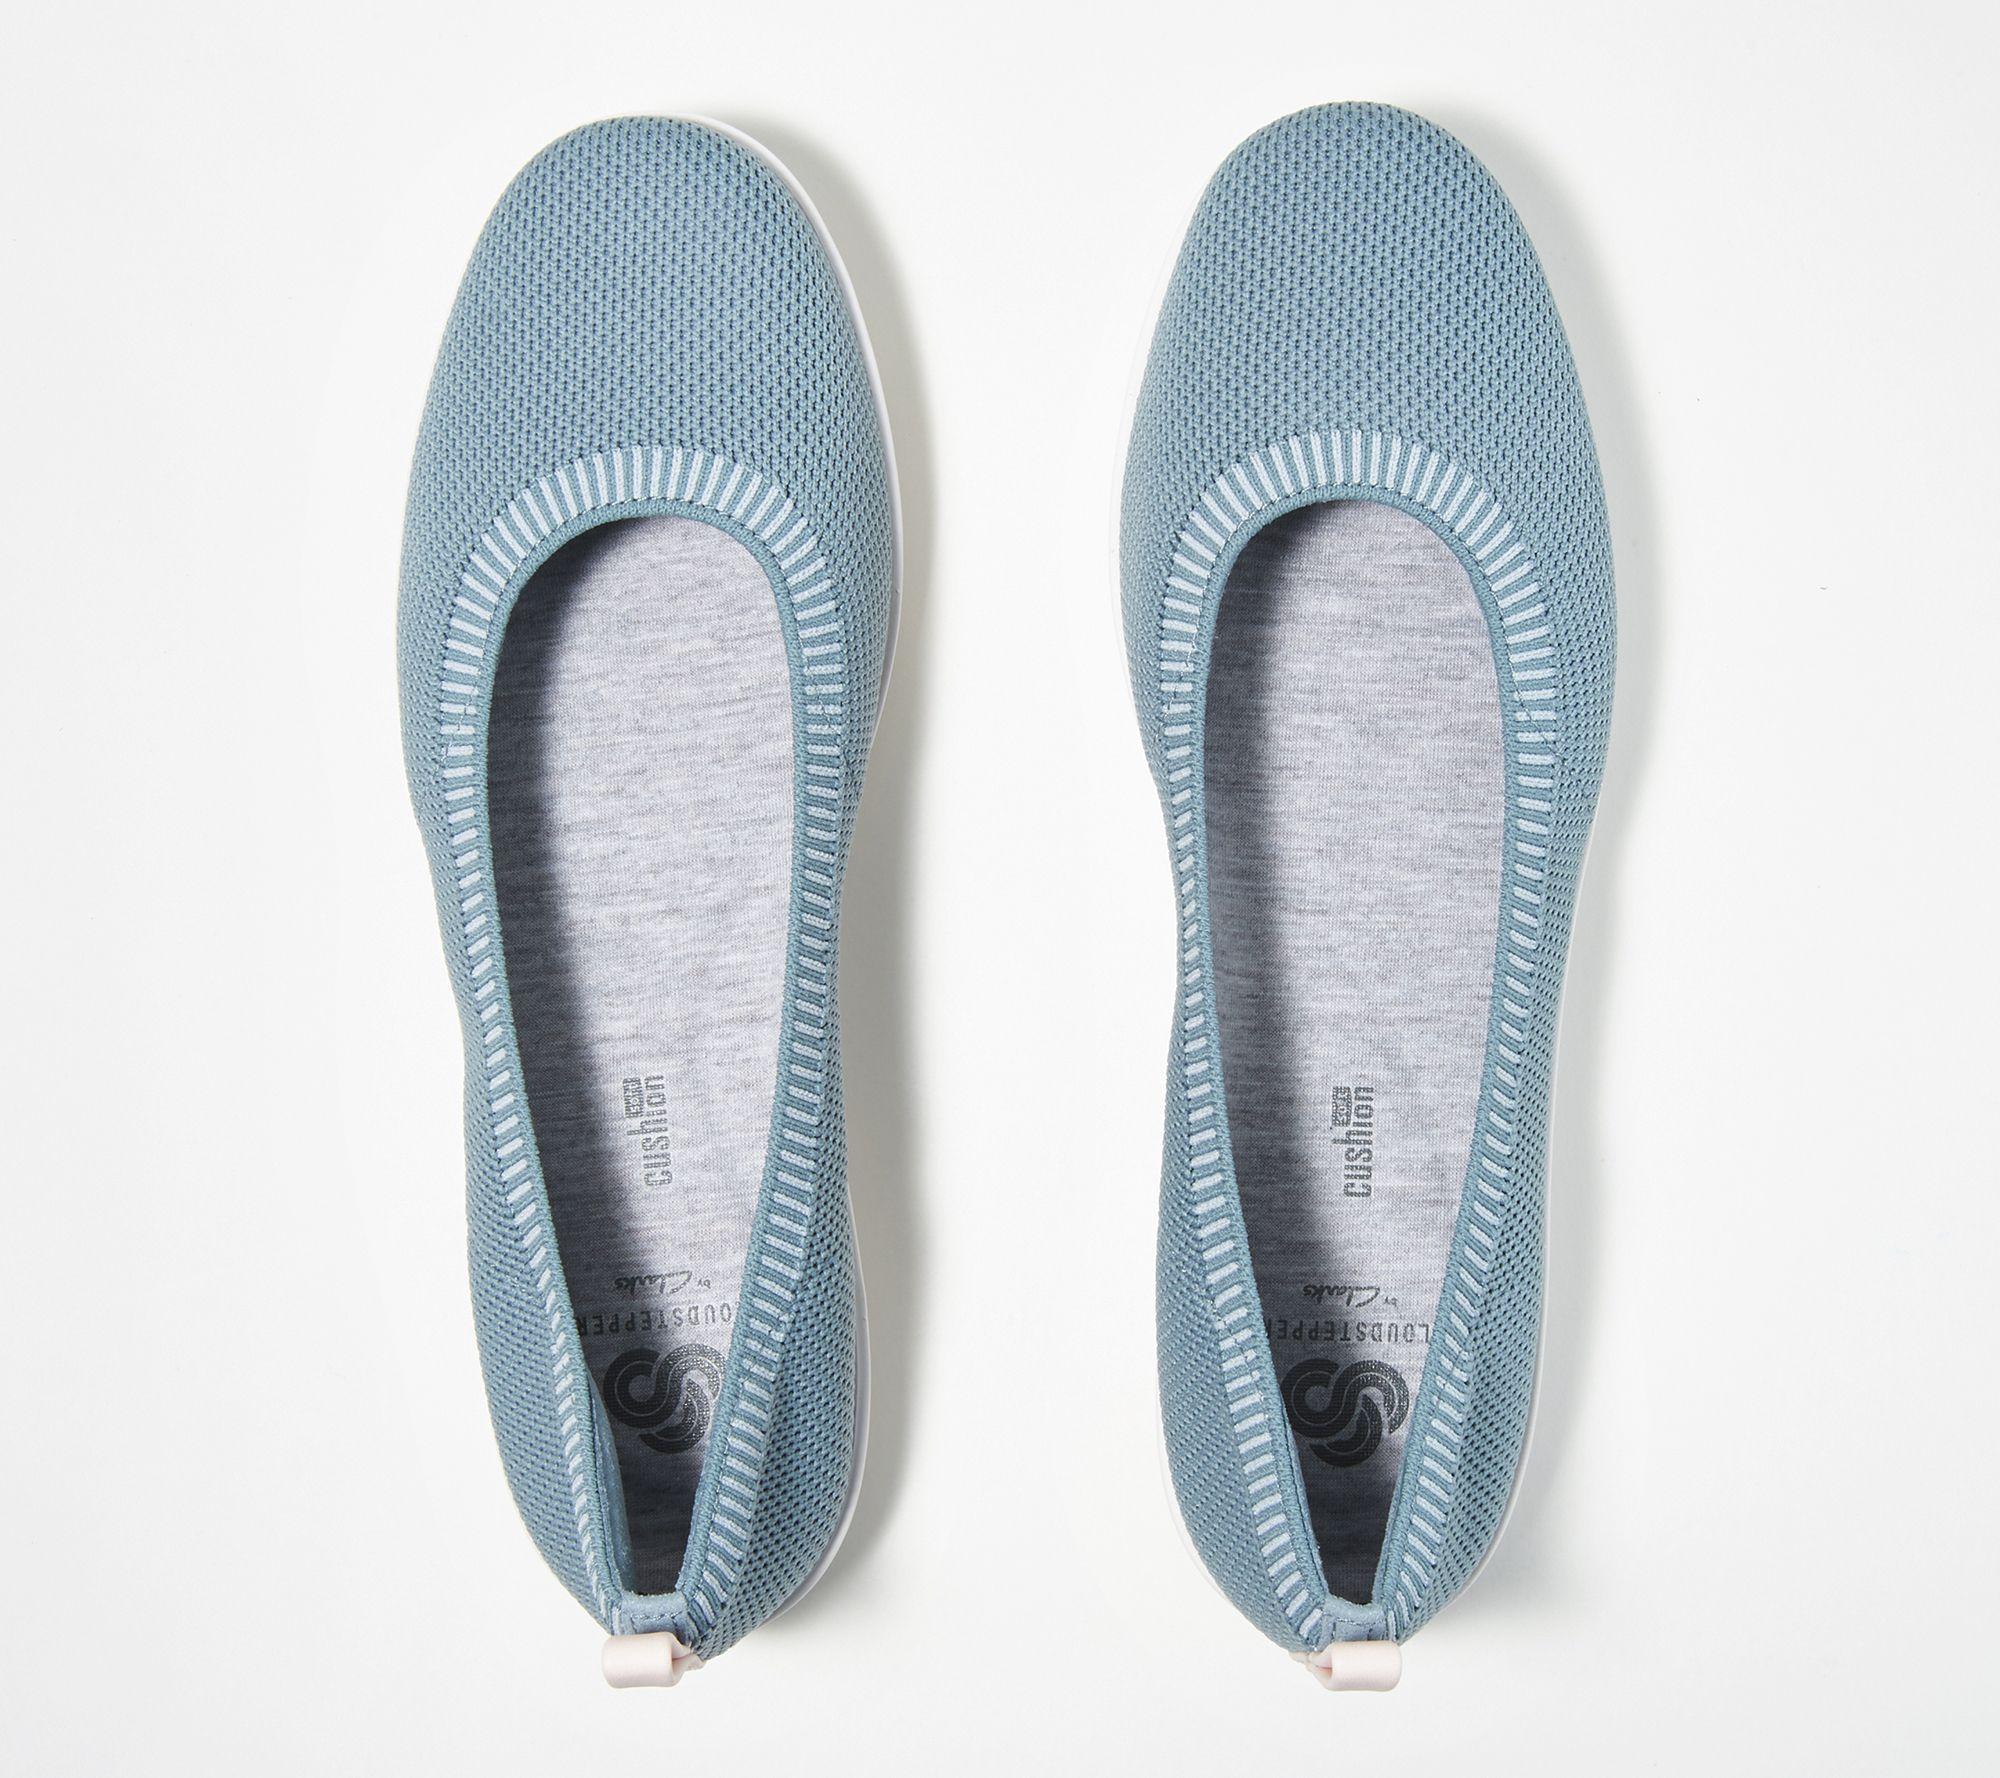 de3be66a CLOUDSTEPPERS by Clarks Slip-on Shoes- Ayla Paige — QVC.com